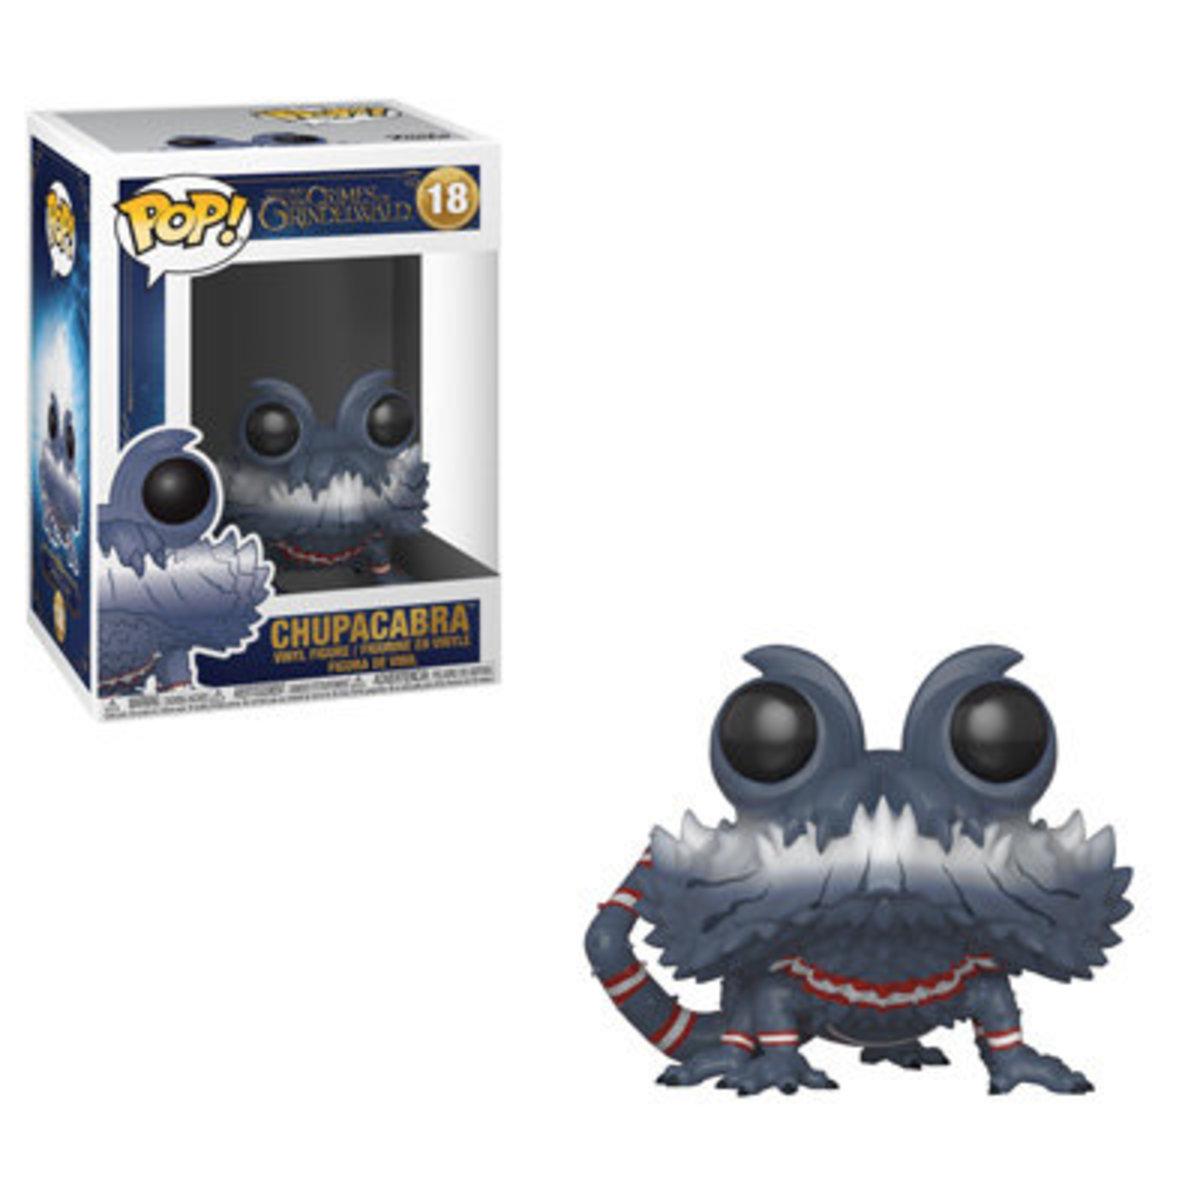 POP 怪獸與葛林戴華德之罪 - Chupacabra